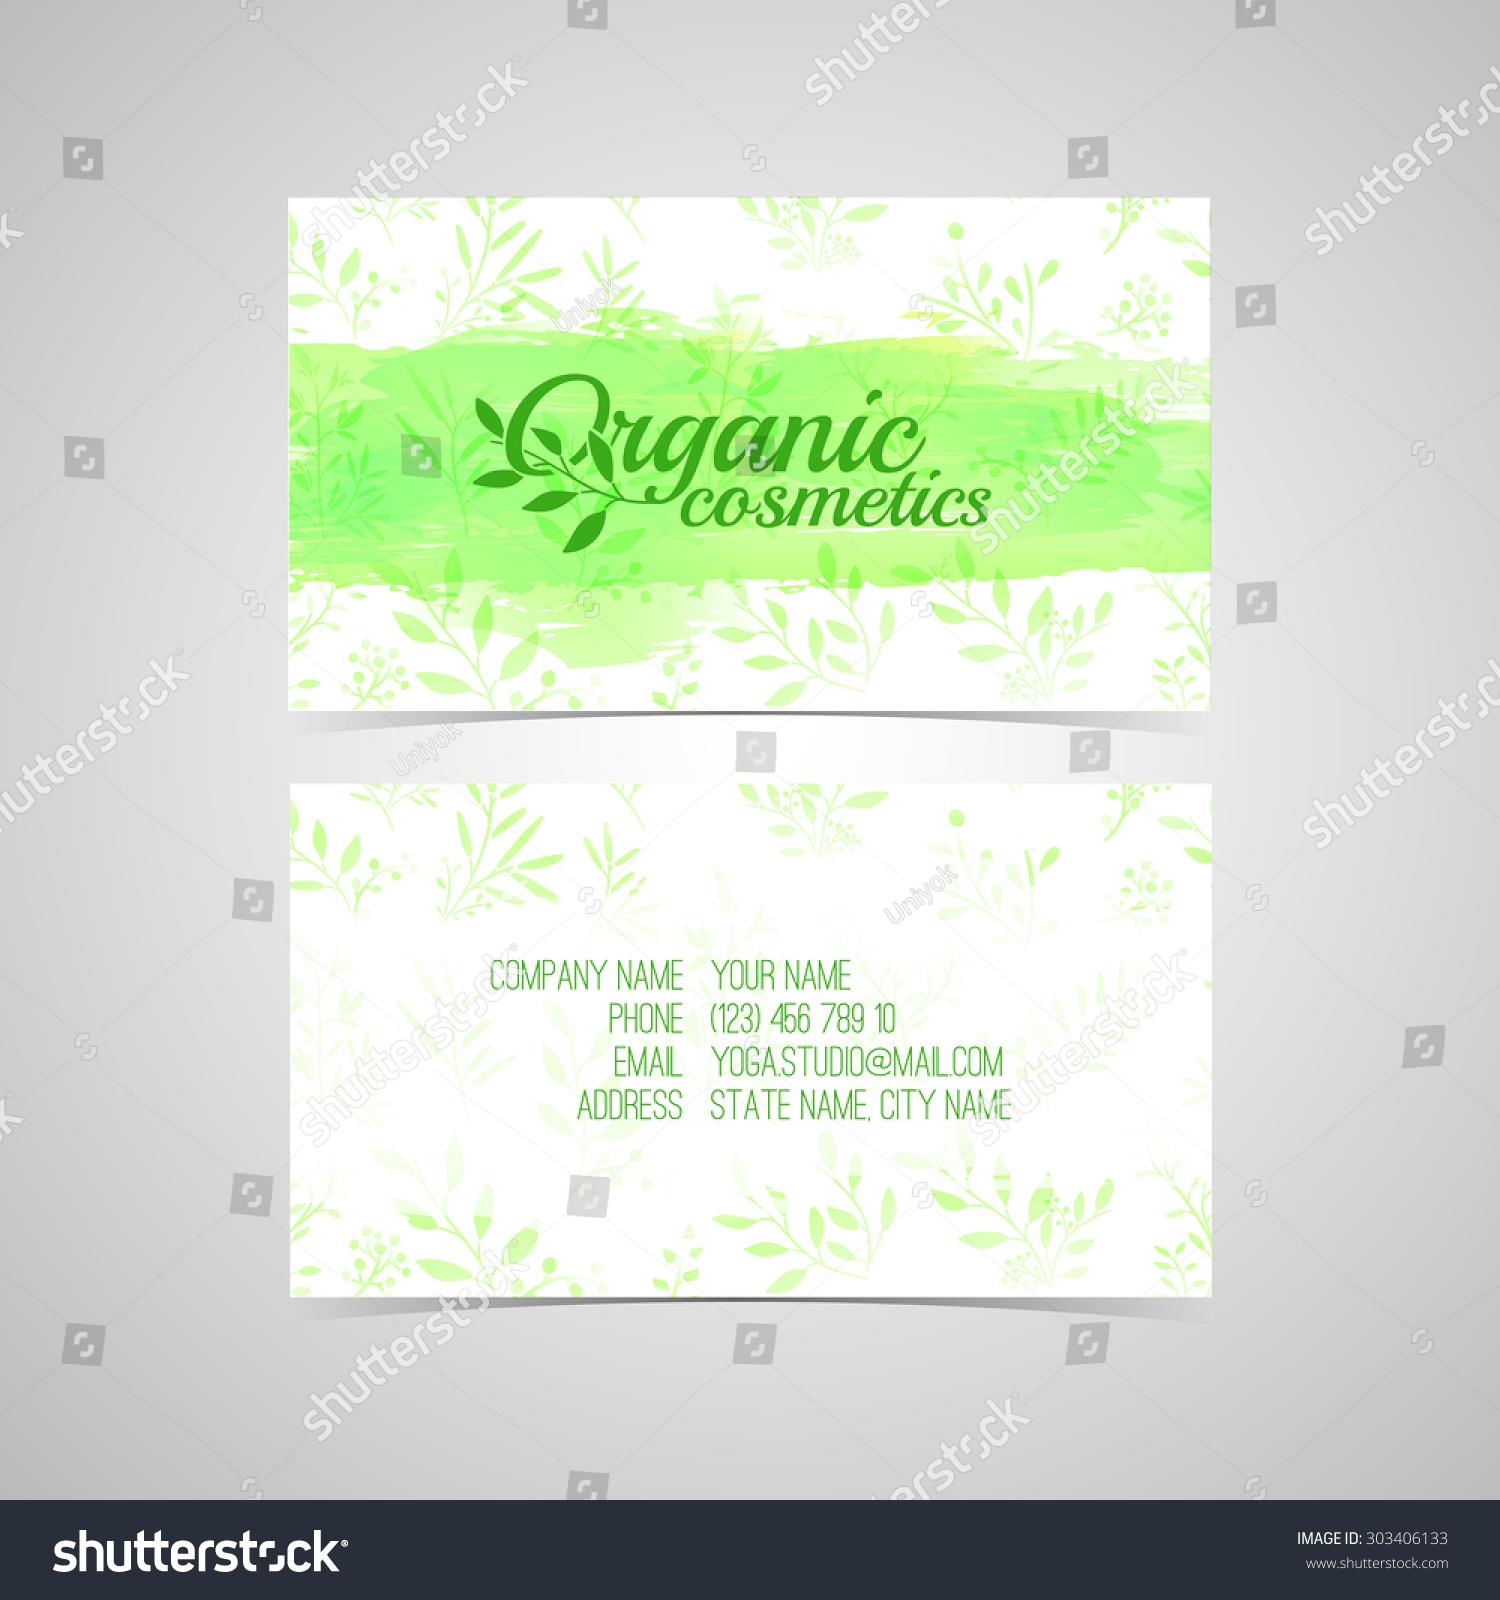 Design Template Organic Cosmetics Business Card Stock Vector ...